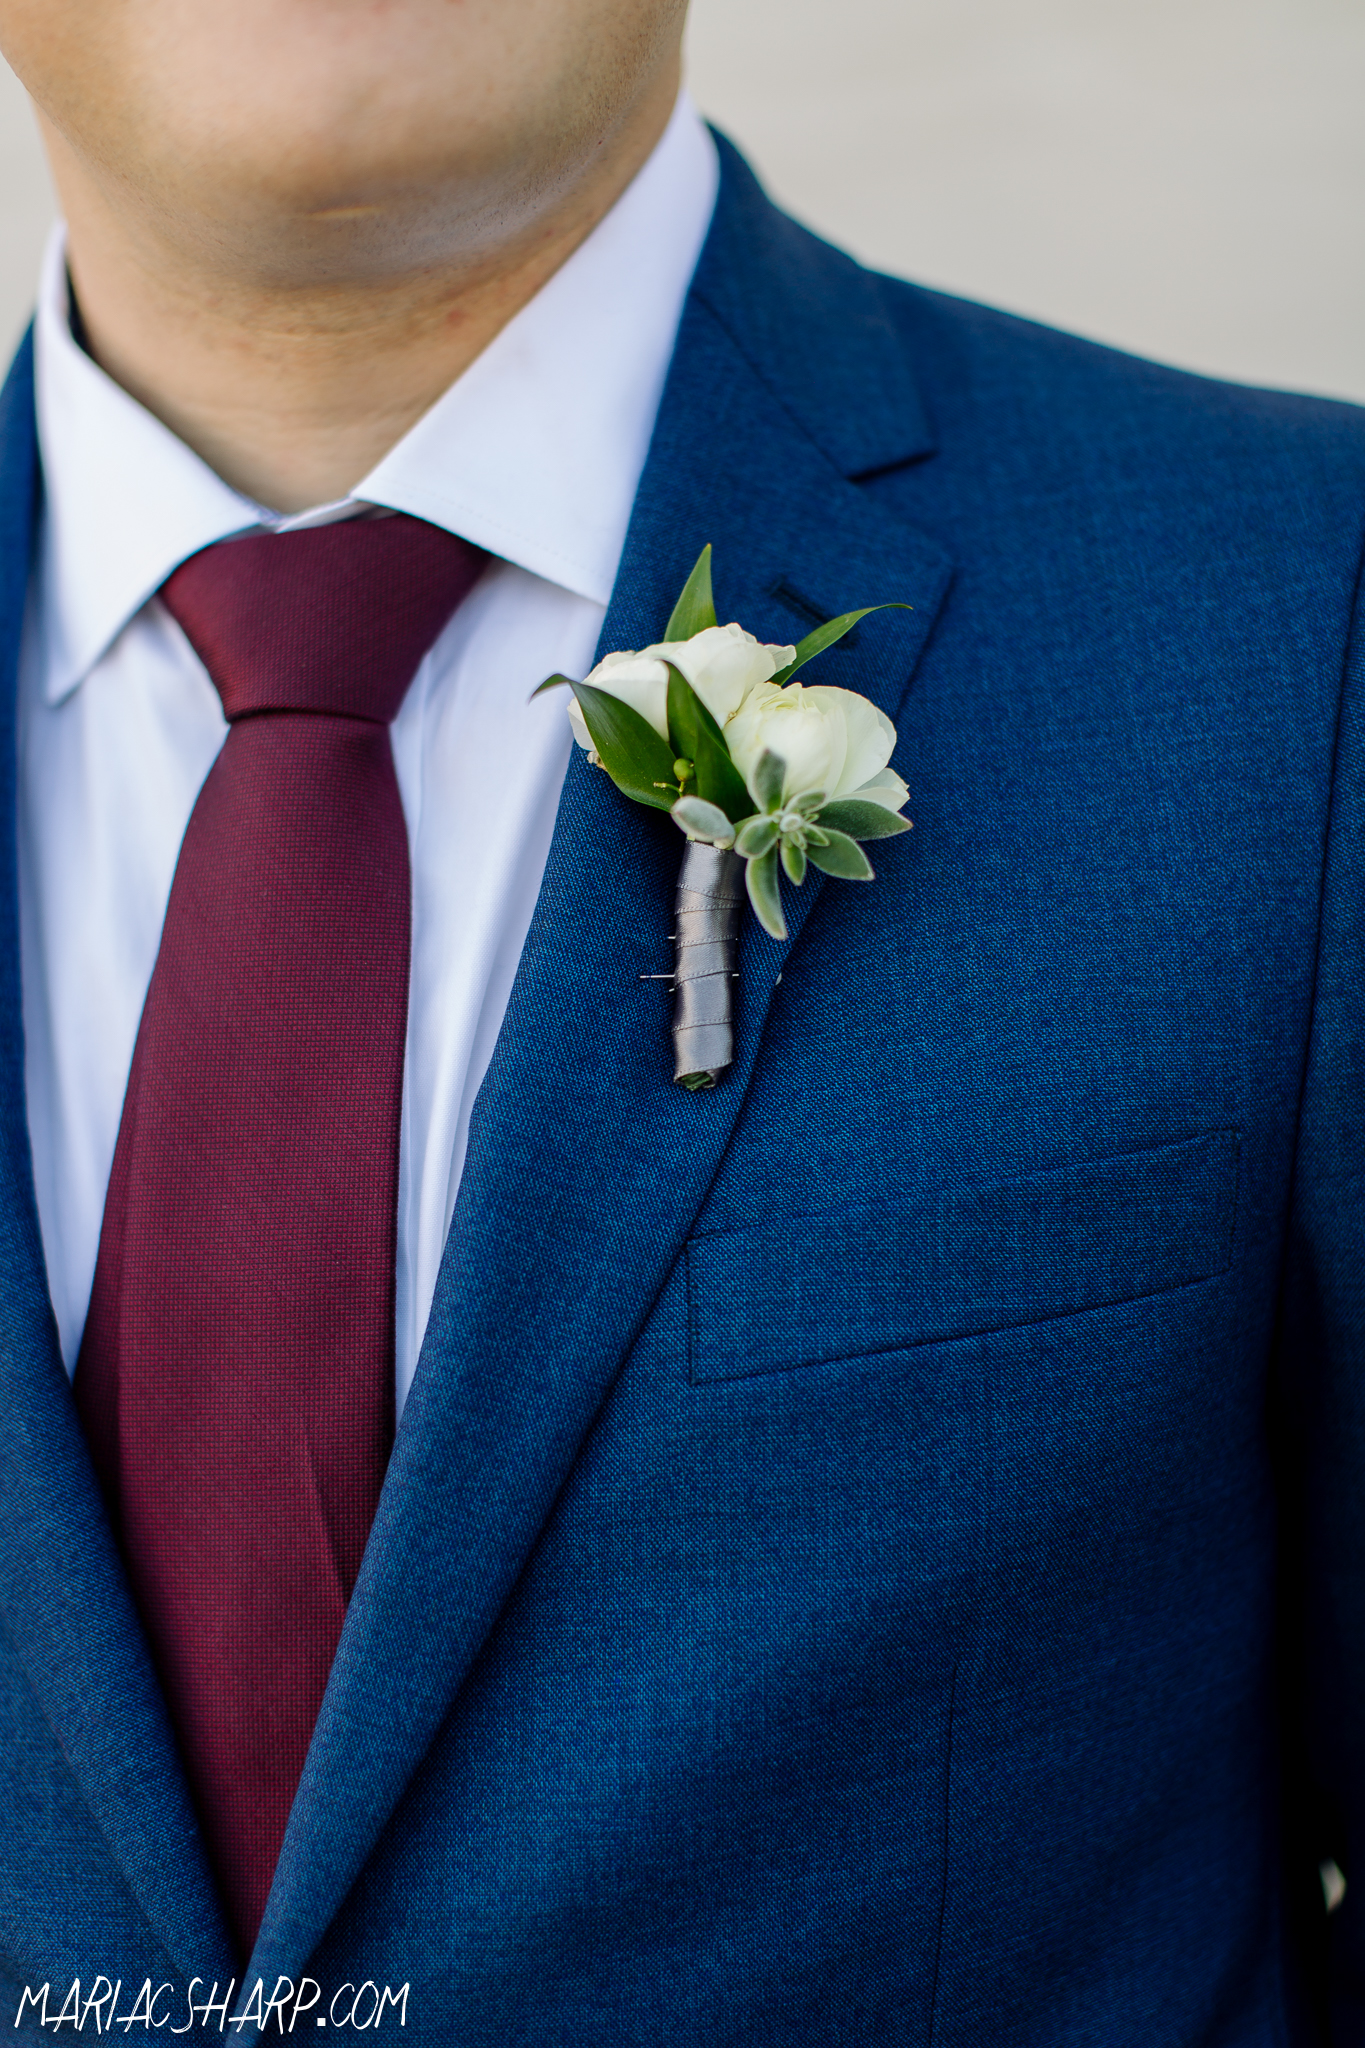 Cassie-Larson-Matt-Seccombe-wedding-20170715-176.jpg